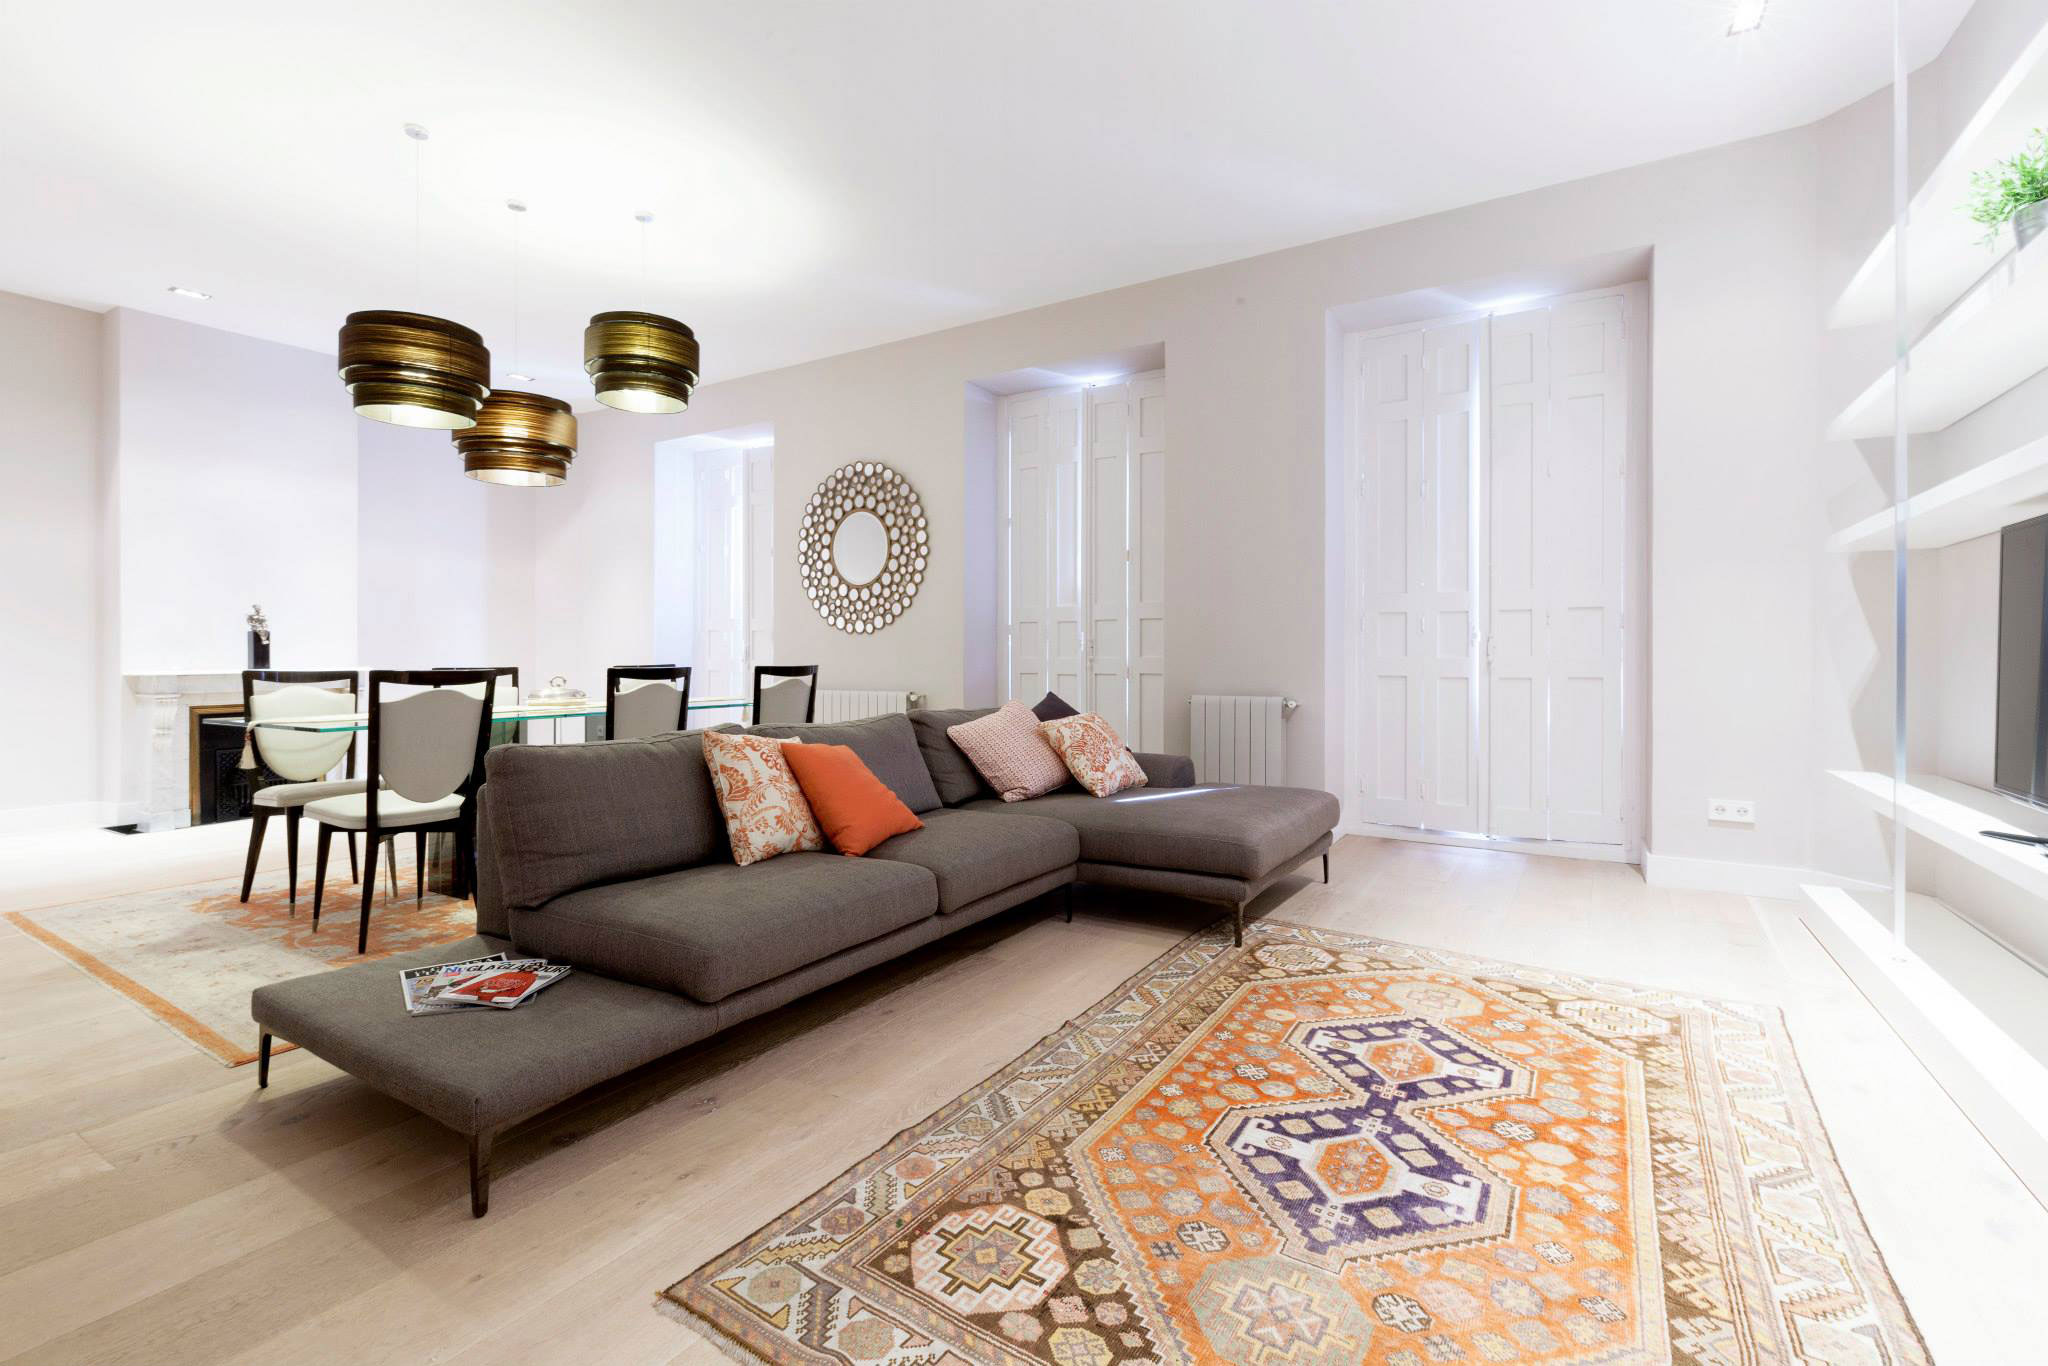 Apartment in Madrid by Simona Garufi (1)